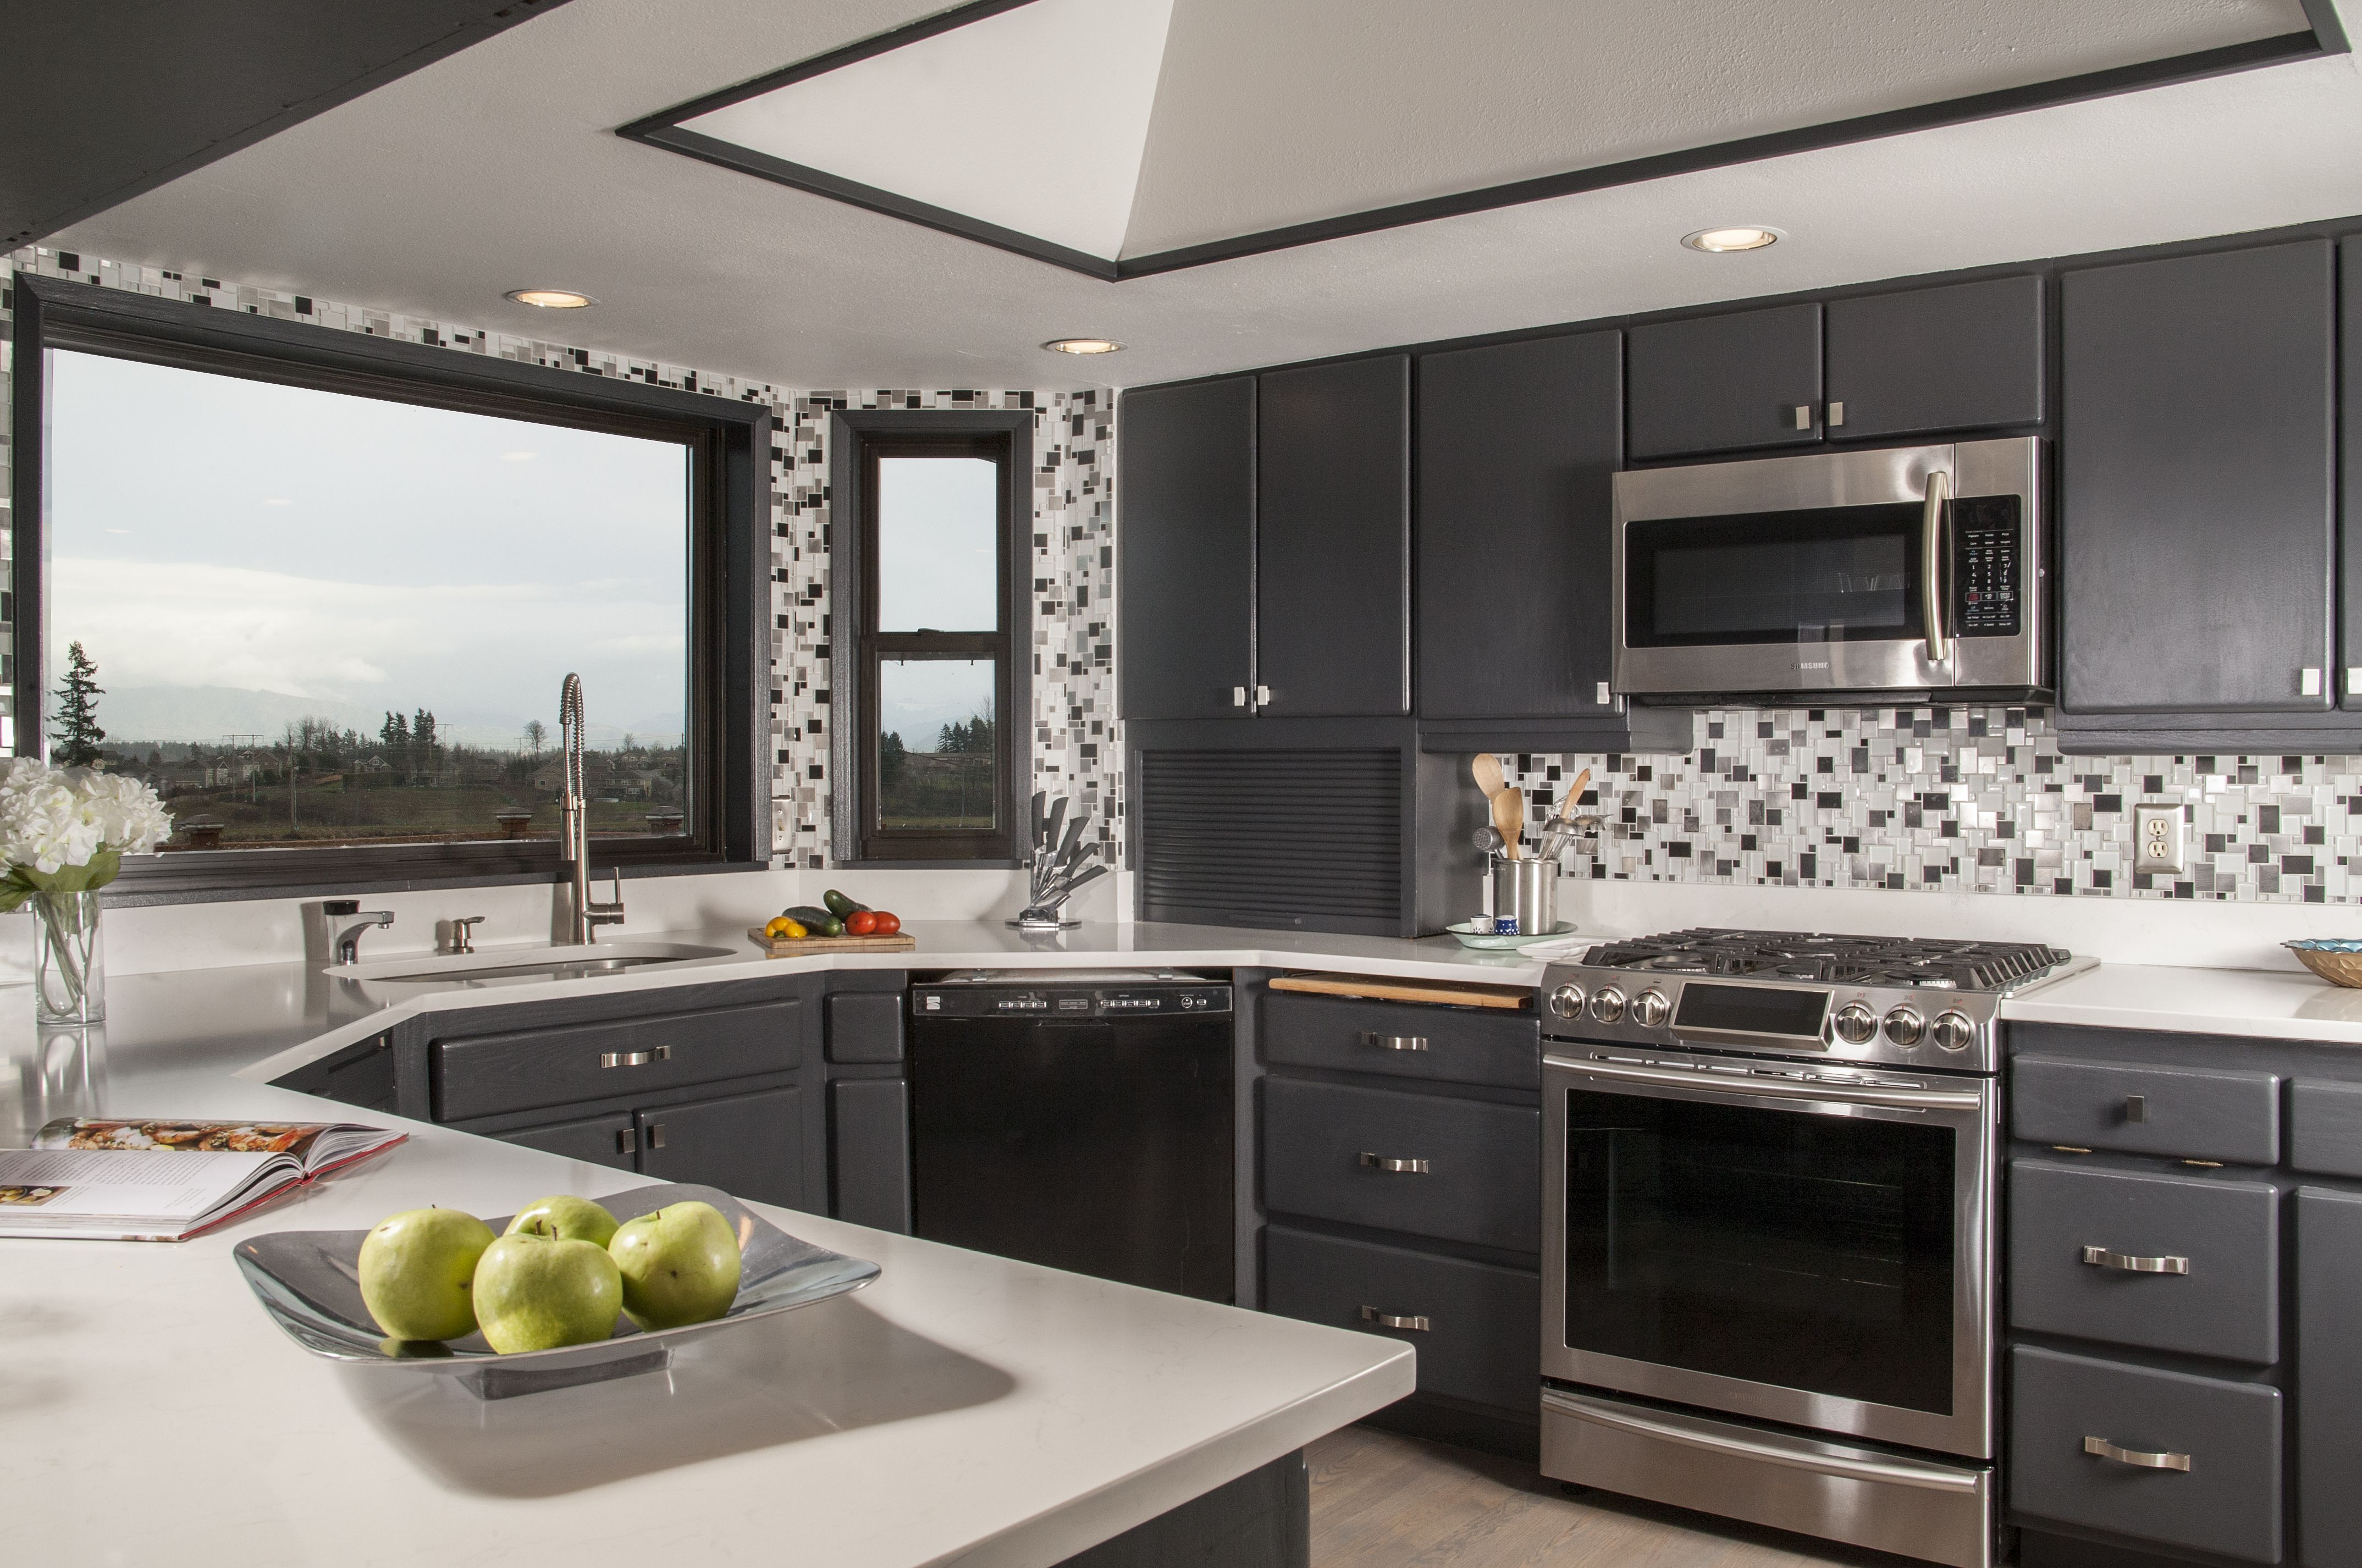 Gray Kitchen Cabinetry, Metallic Mosaic Backsplash, Refreshed Cabinets  Corinne